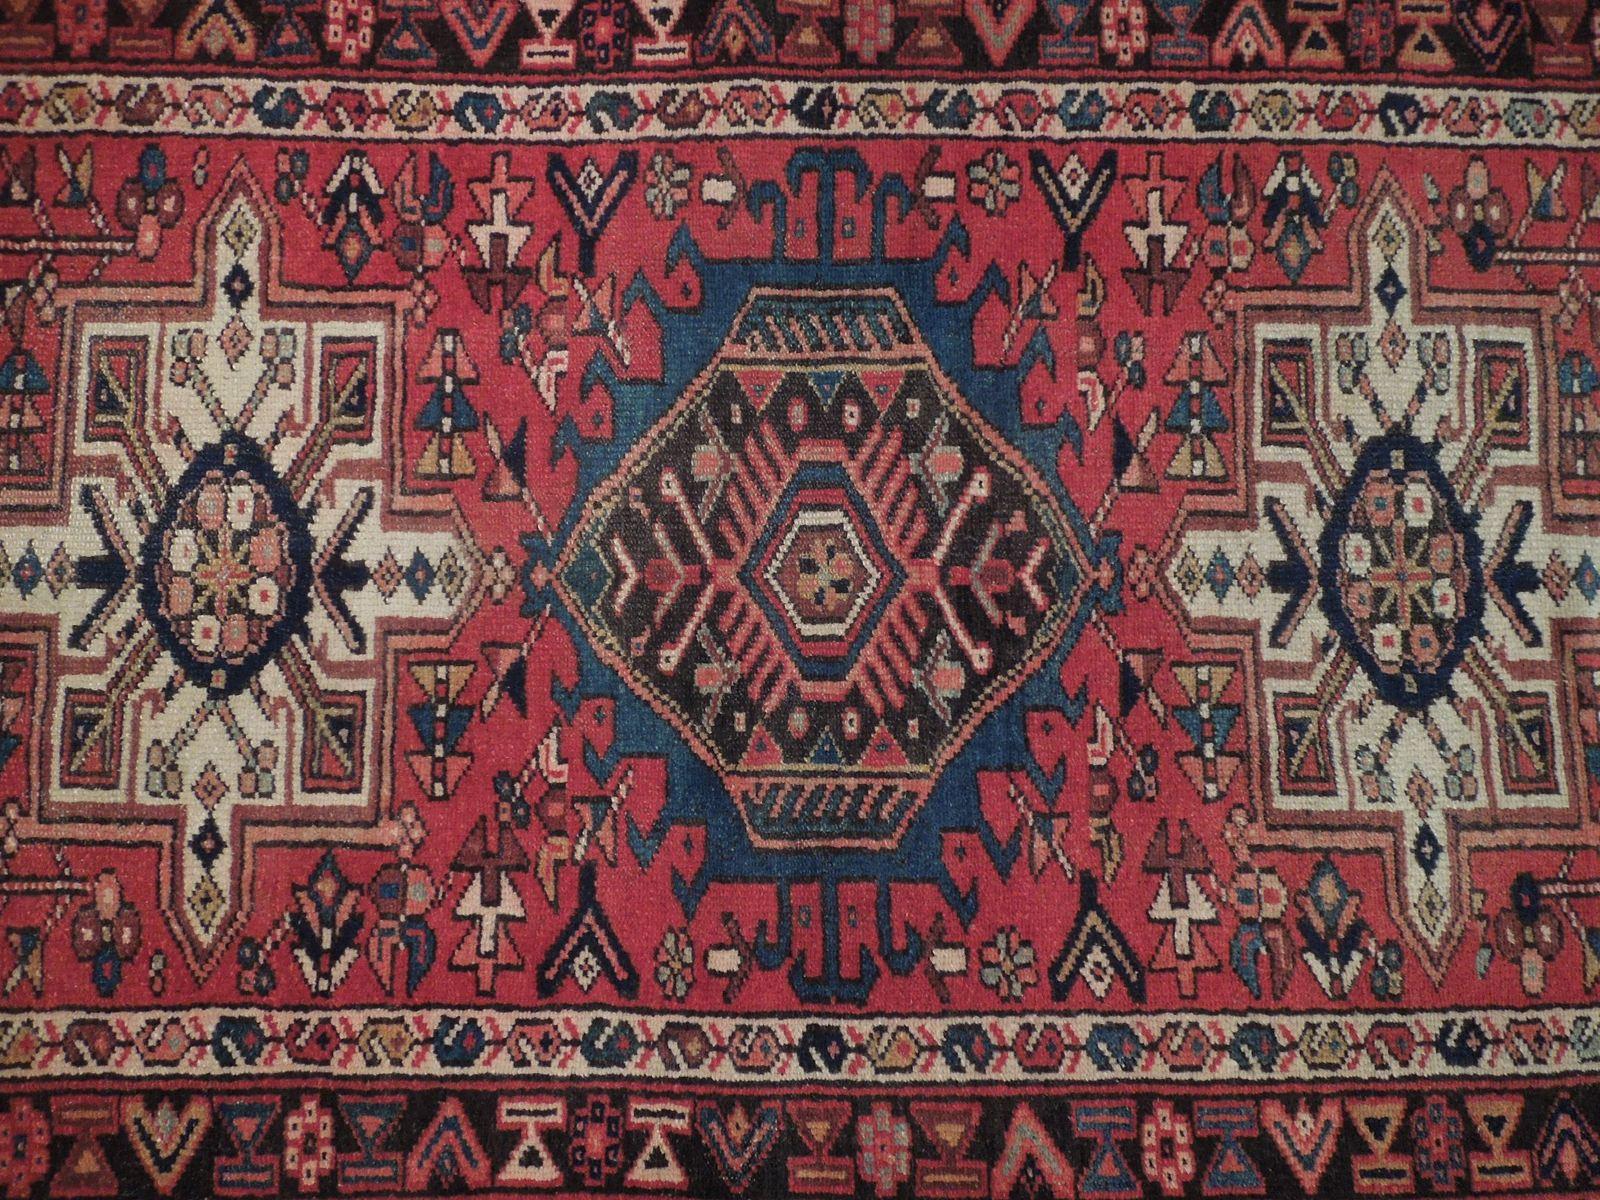 Red 3 x 13 All-Over Classic Tribal Design Runner Karaja Persian Handmade Rug image 6